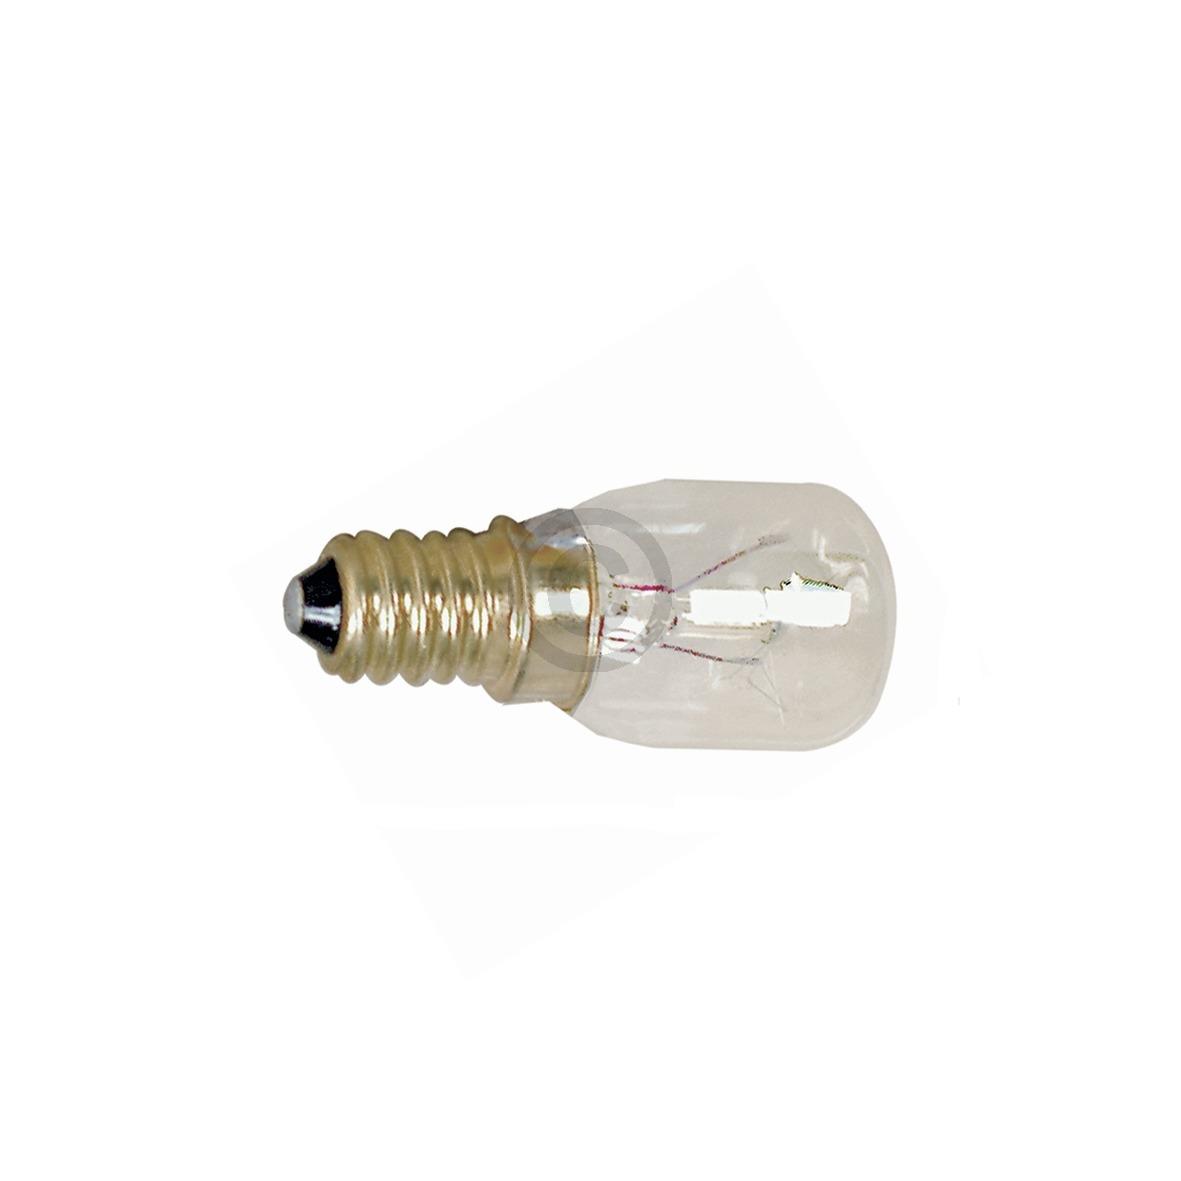 Lampe E14 15W 26mmØ 60mm 240V Universal AEG, Electrolux, Juno, Zanussi